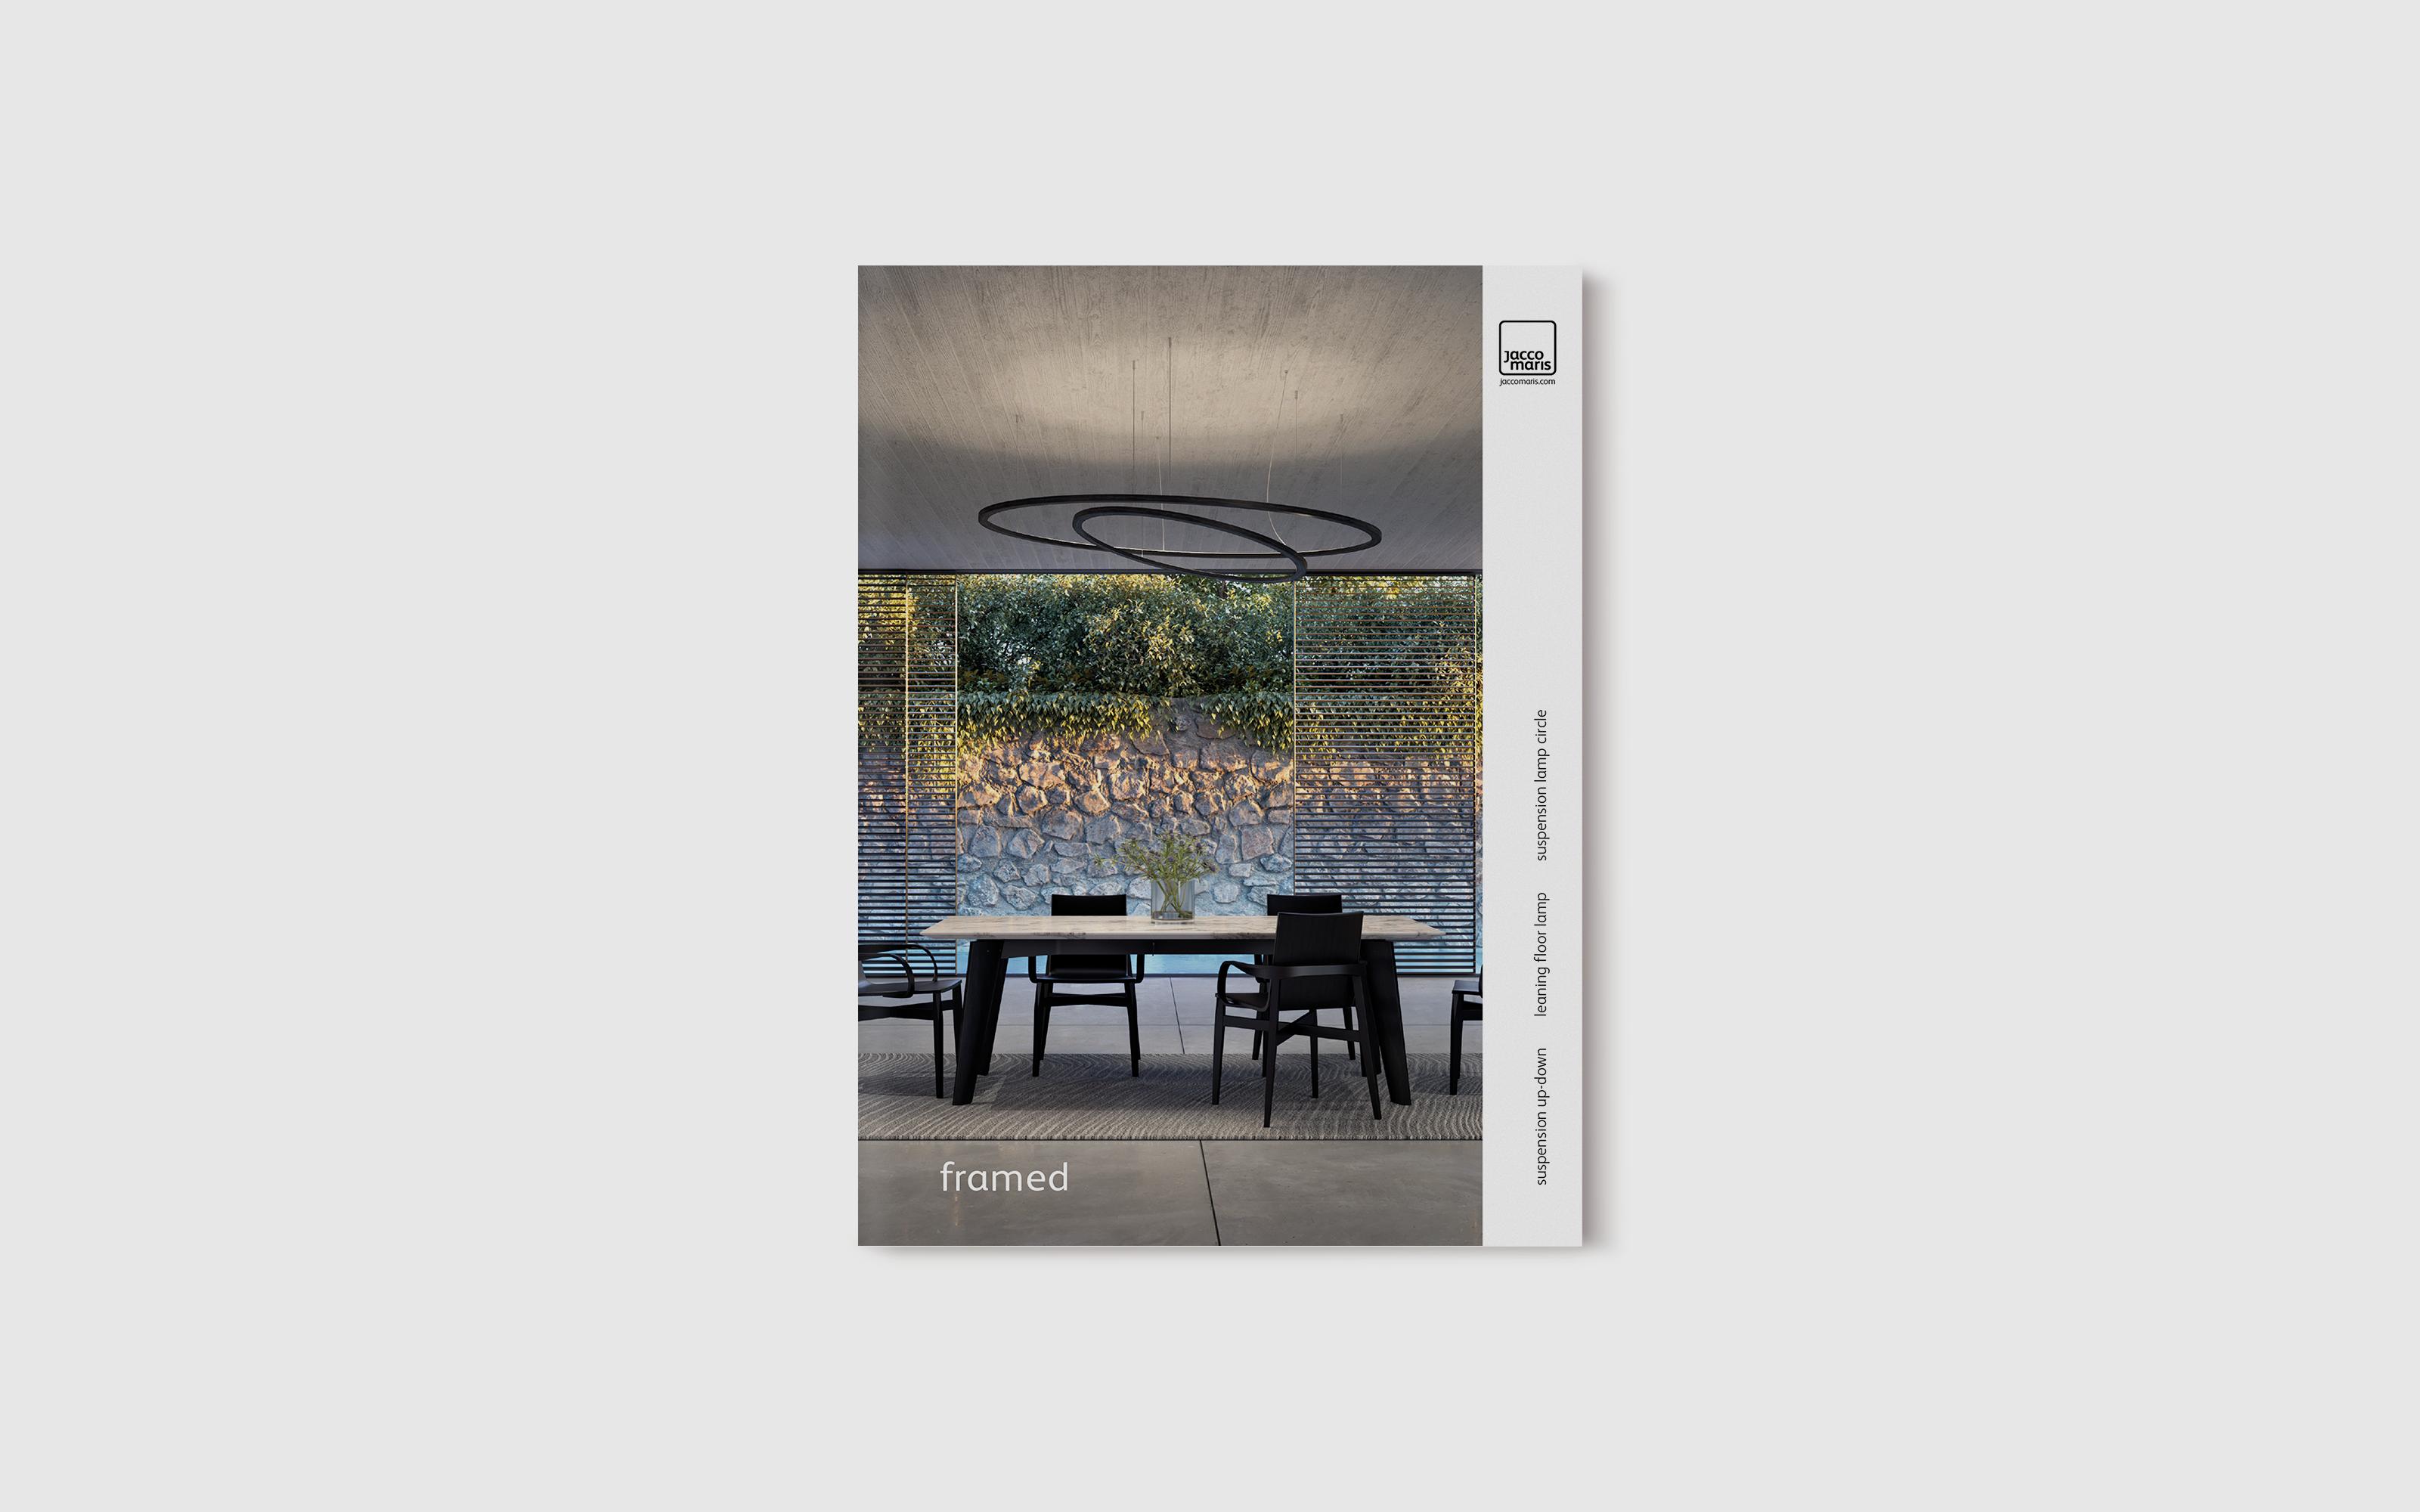 Anouk-Stoffels-JM-framed01